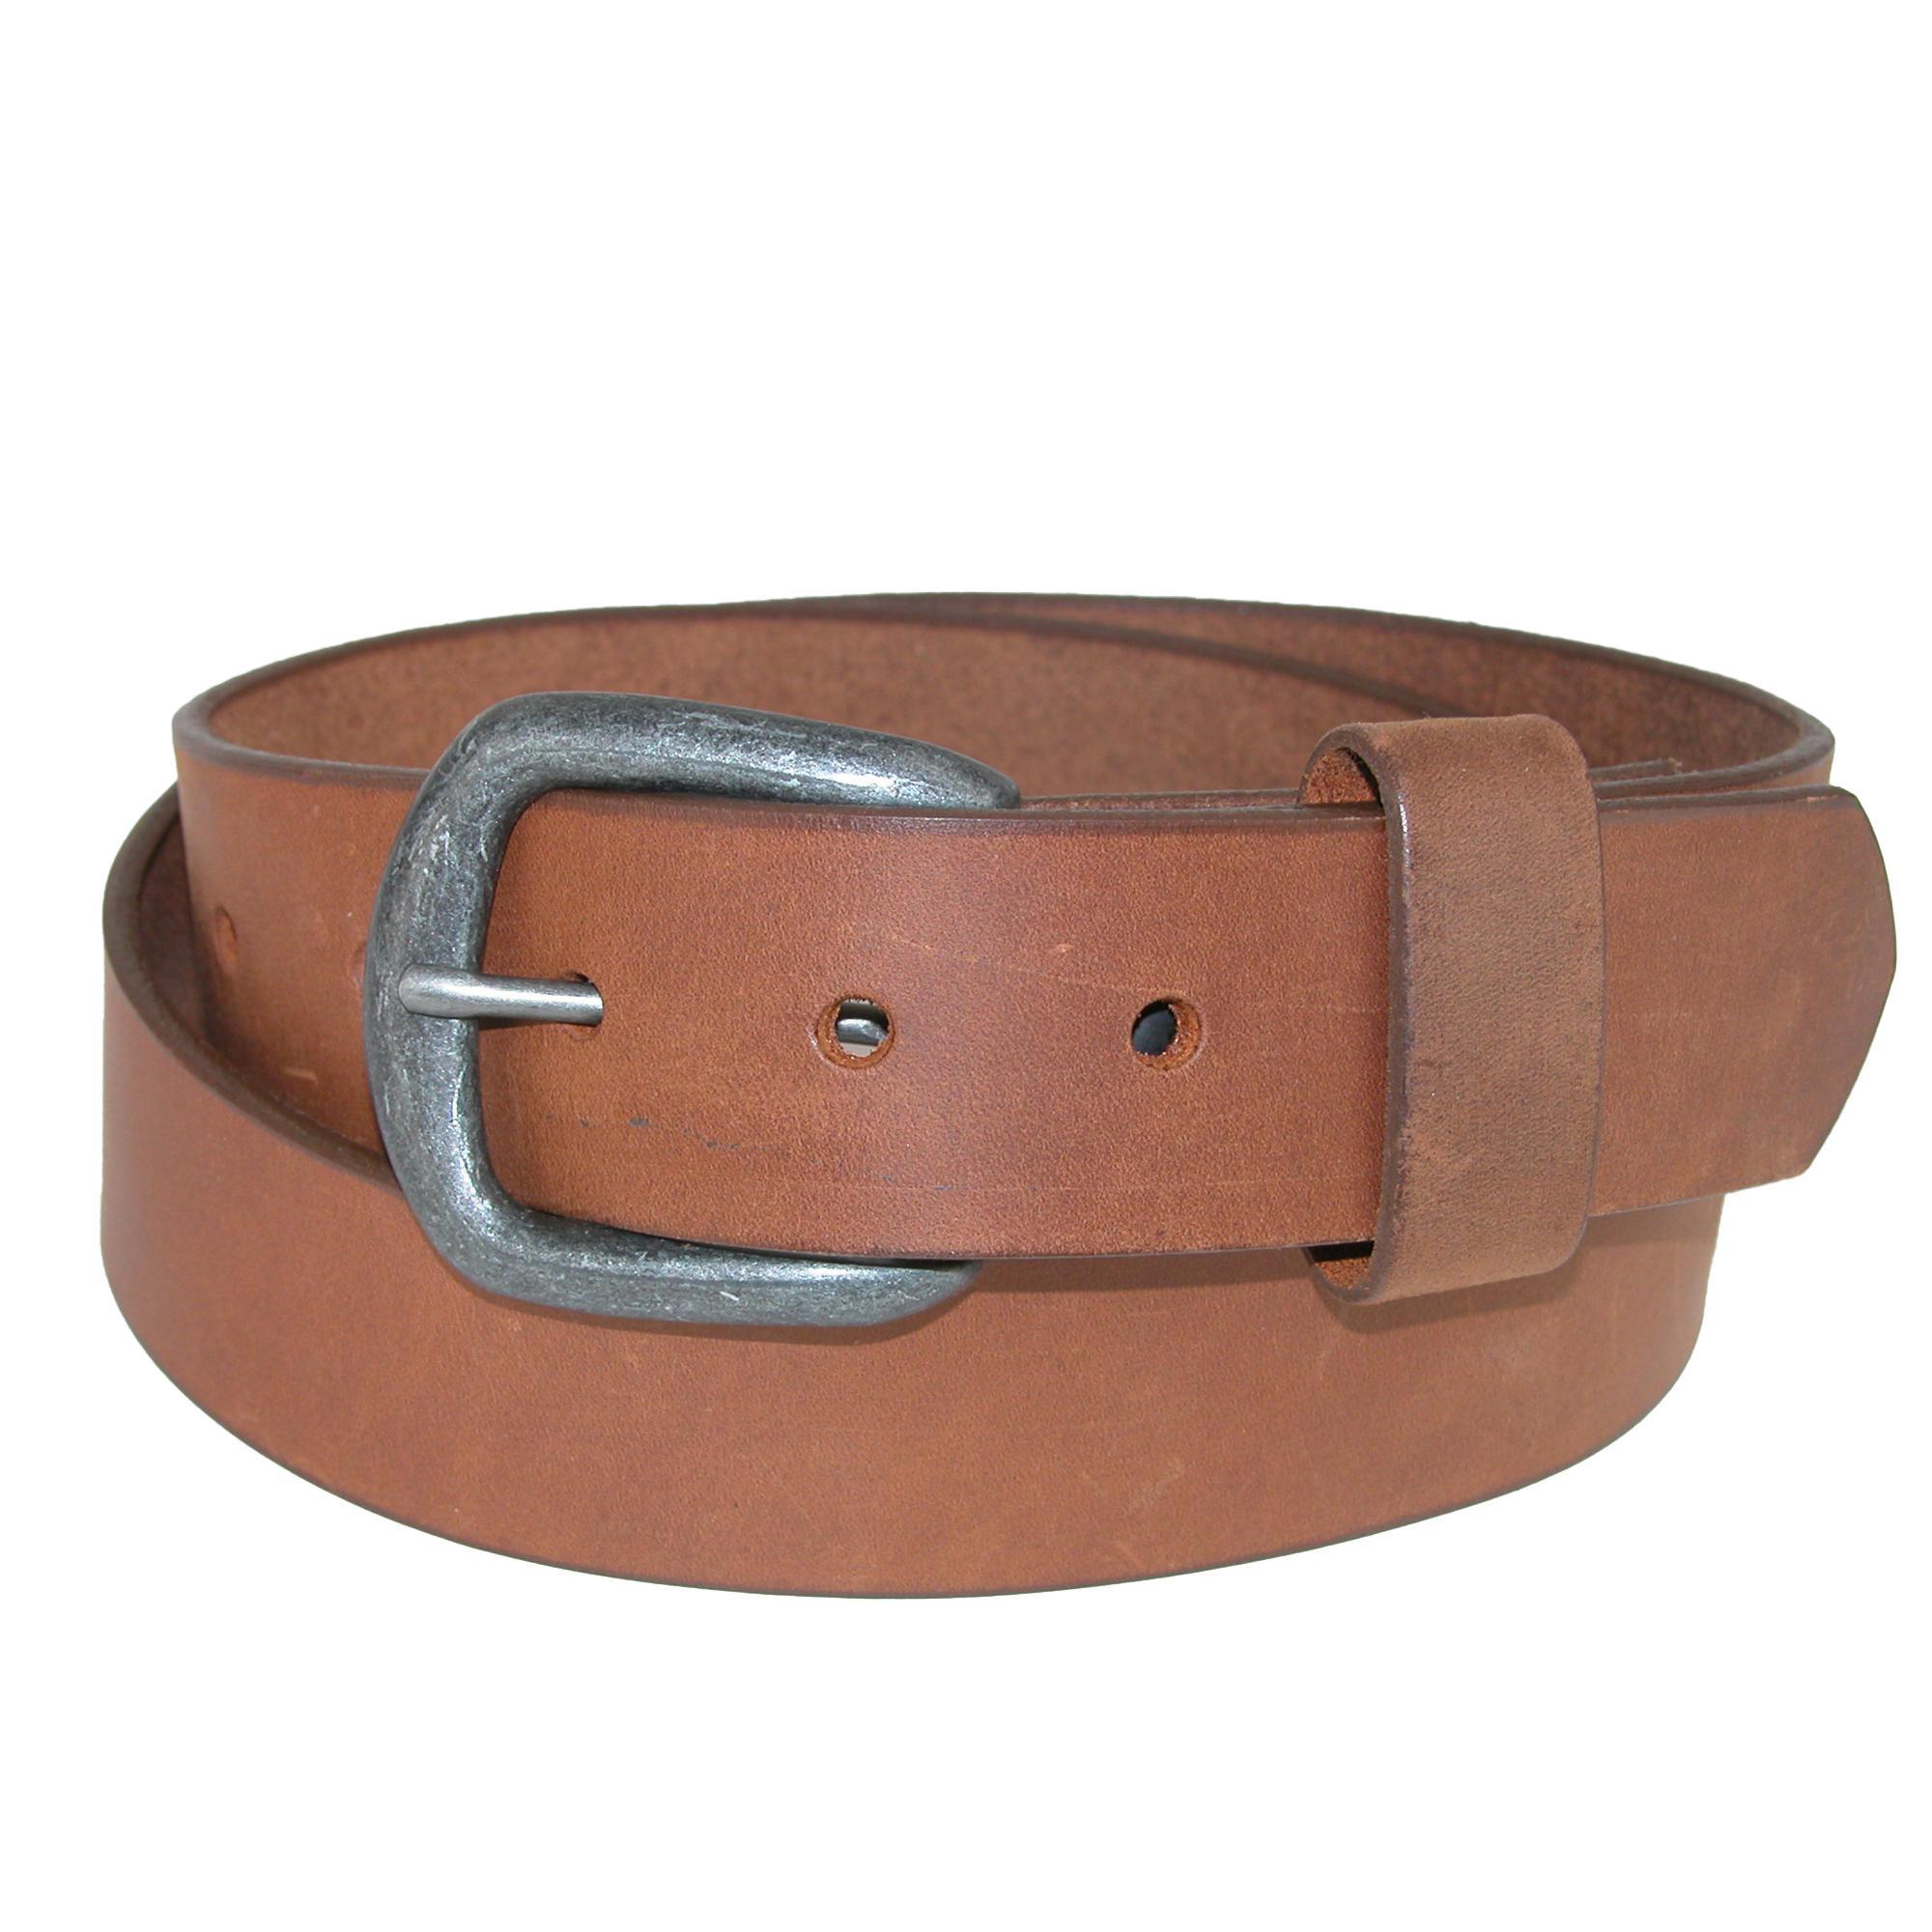 Boston Leather Men's Copper Explorer Pull Up Leather Bridle Belt